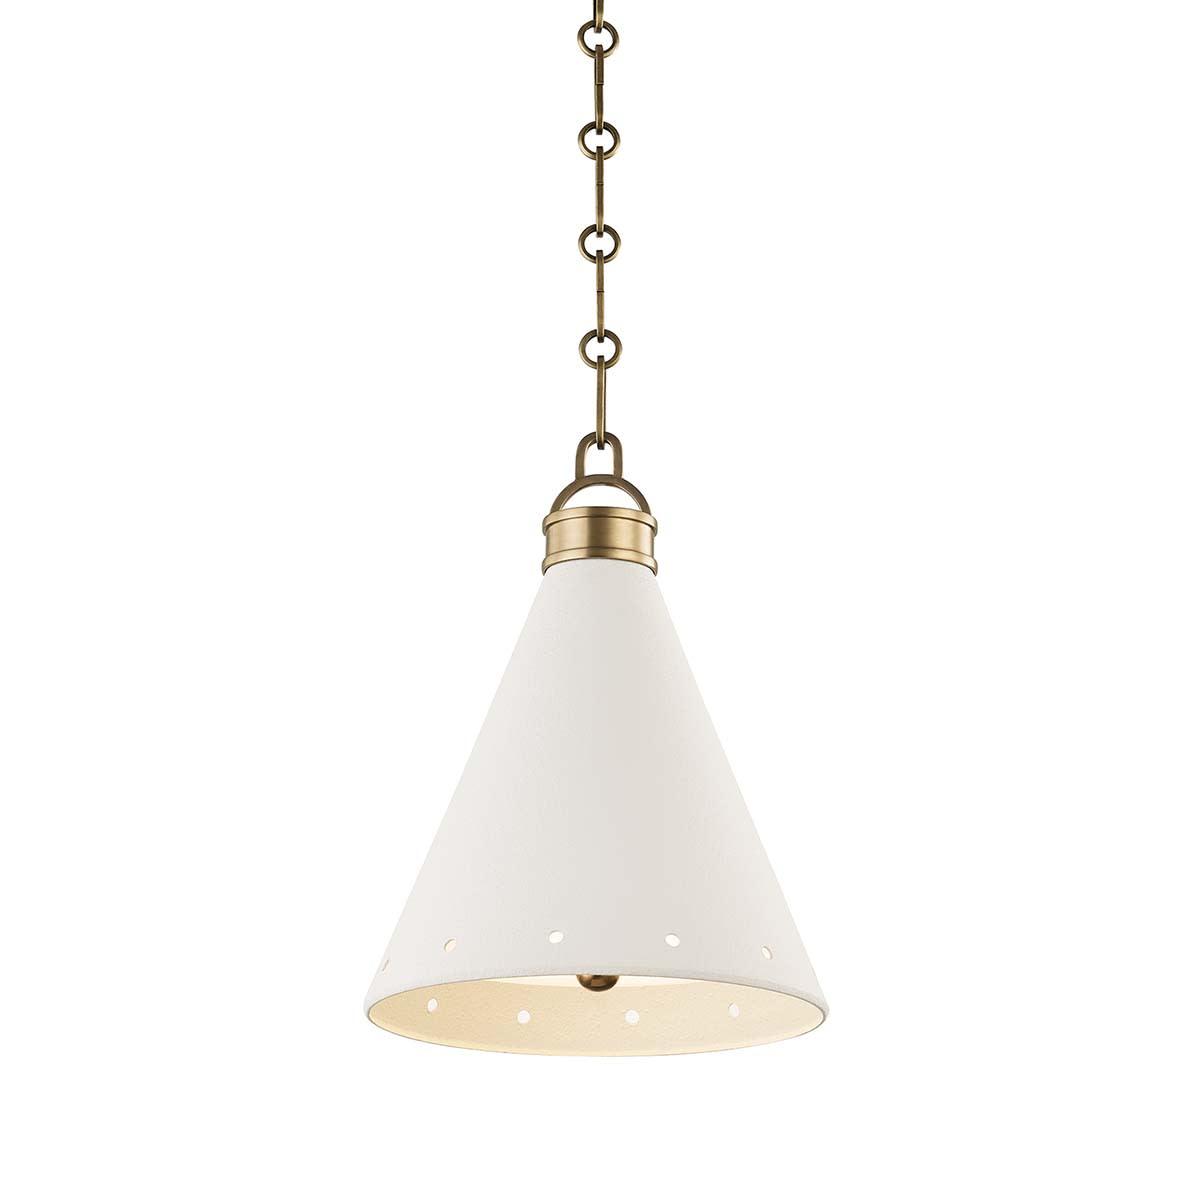 Hudson Valley lighting pendant from Build.com